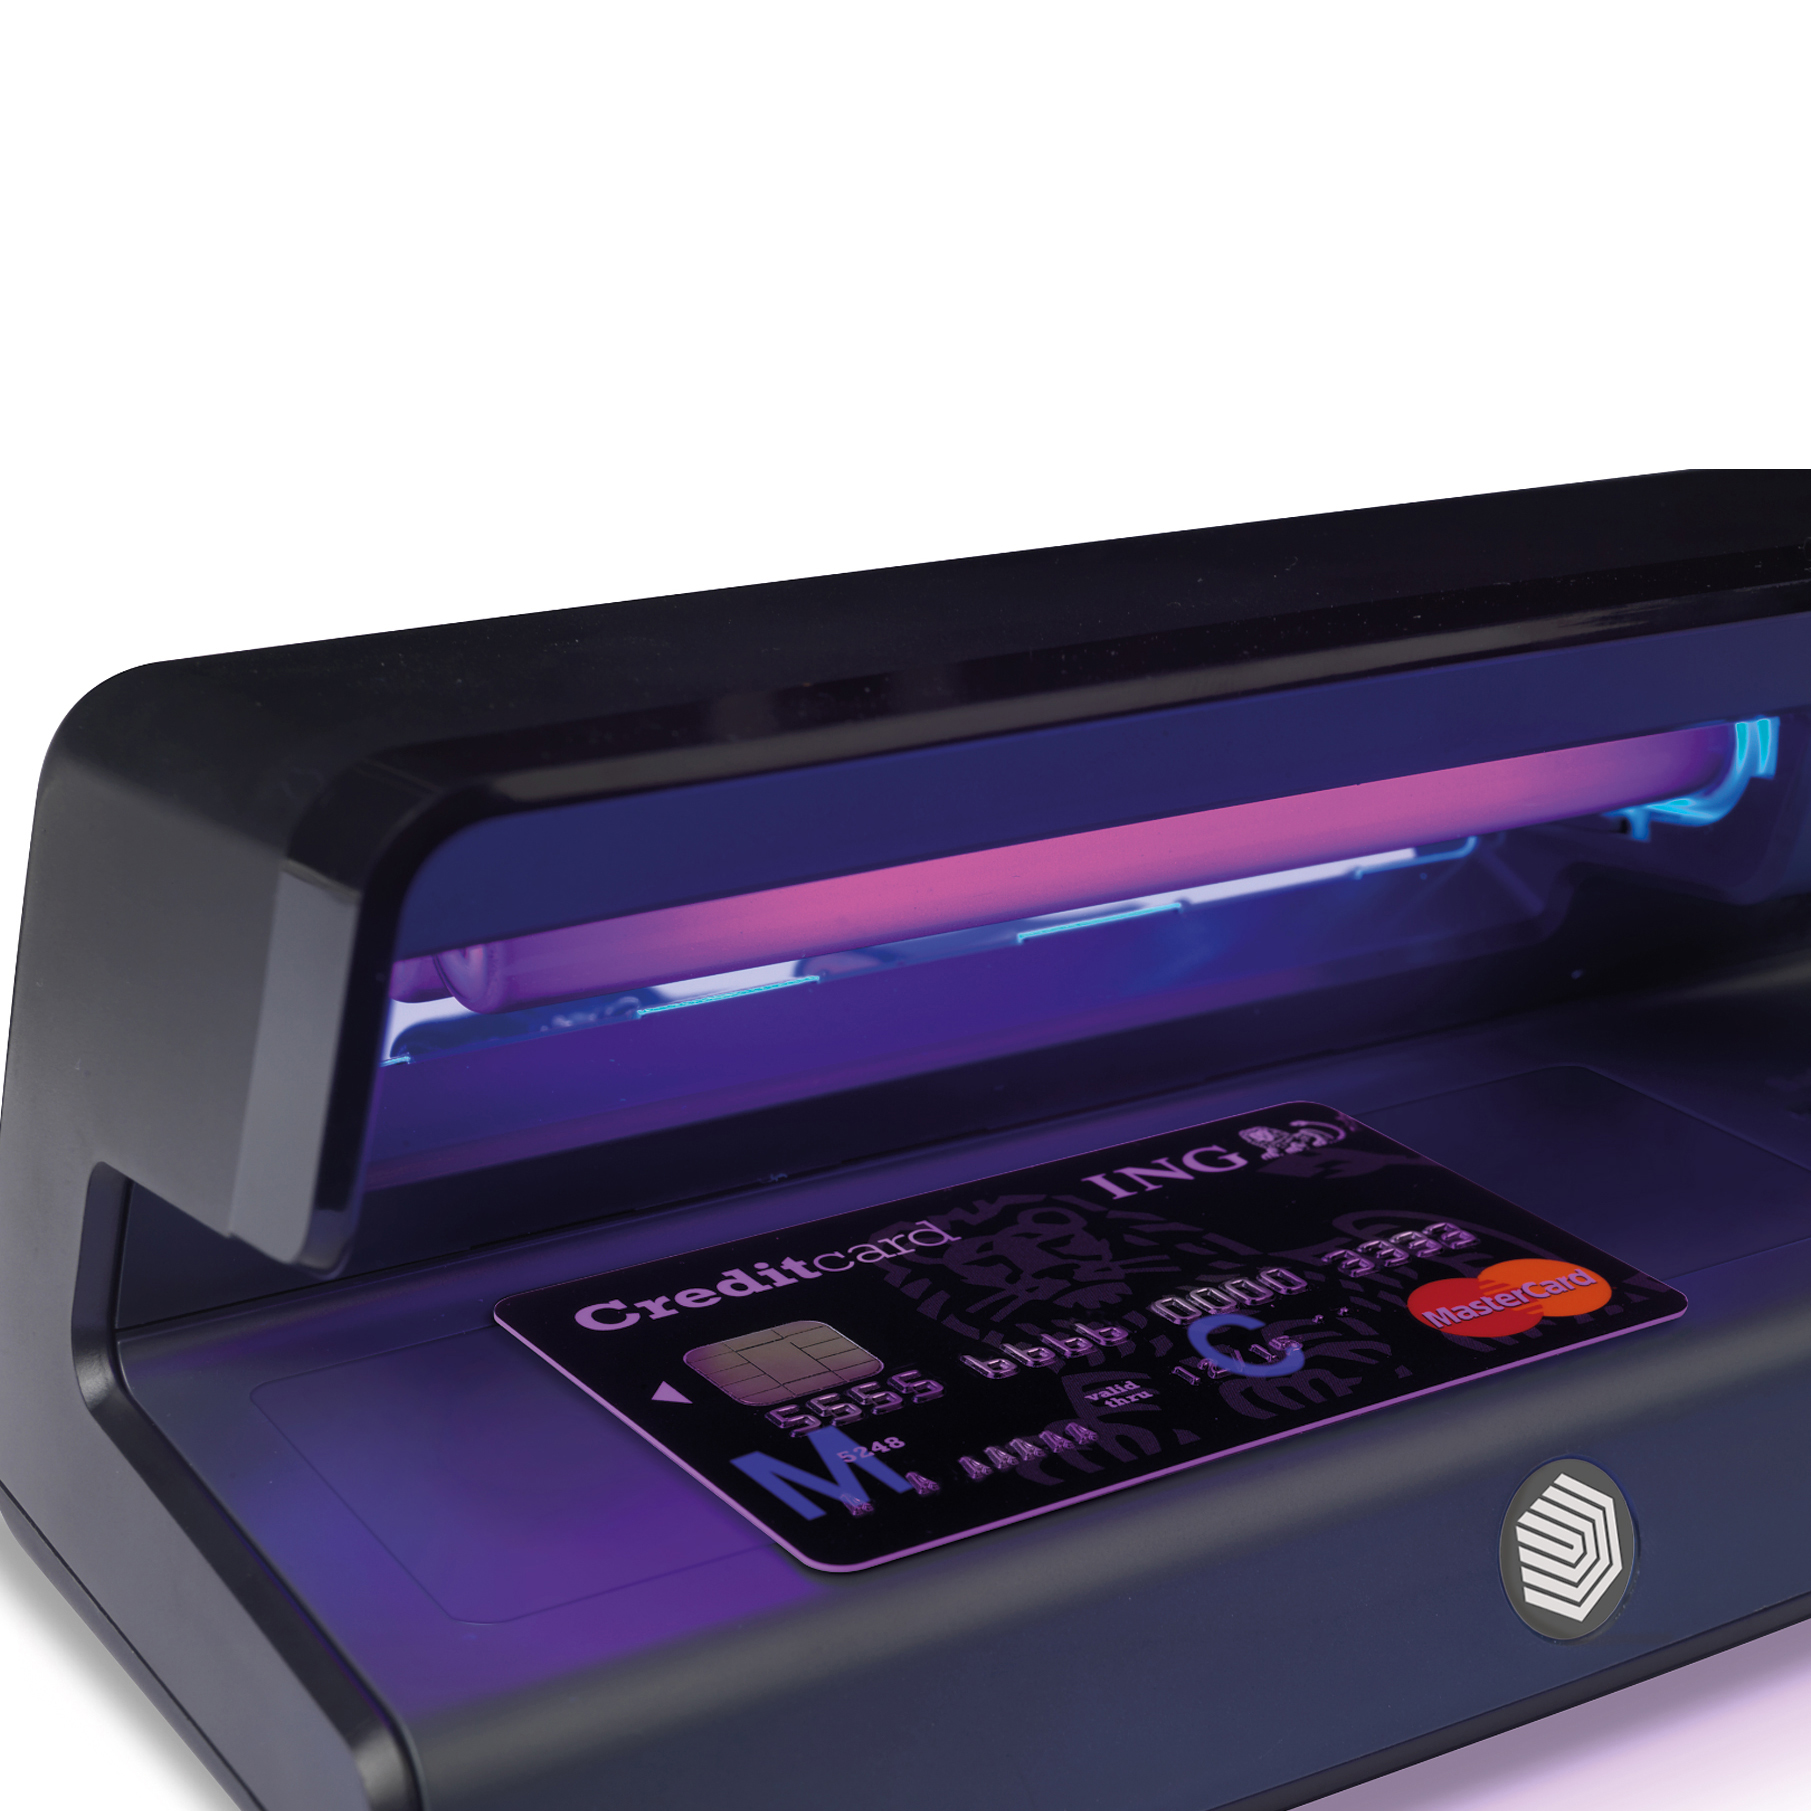 Safescan 50 UV Counterfeit Detector Checker 0.515g L206xW102xH88mm Black Ref 131-0399